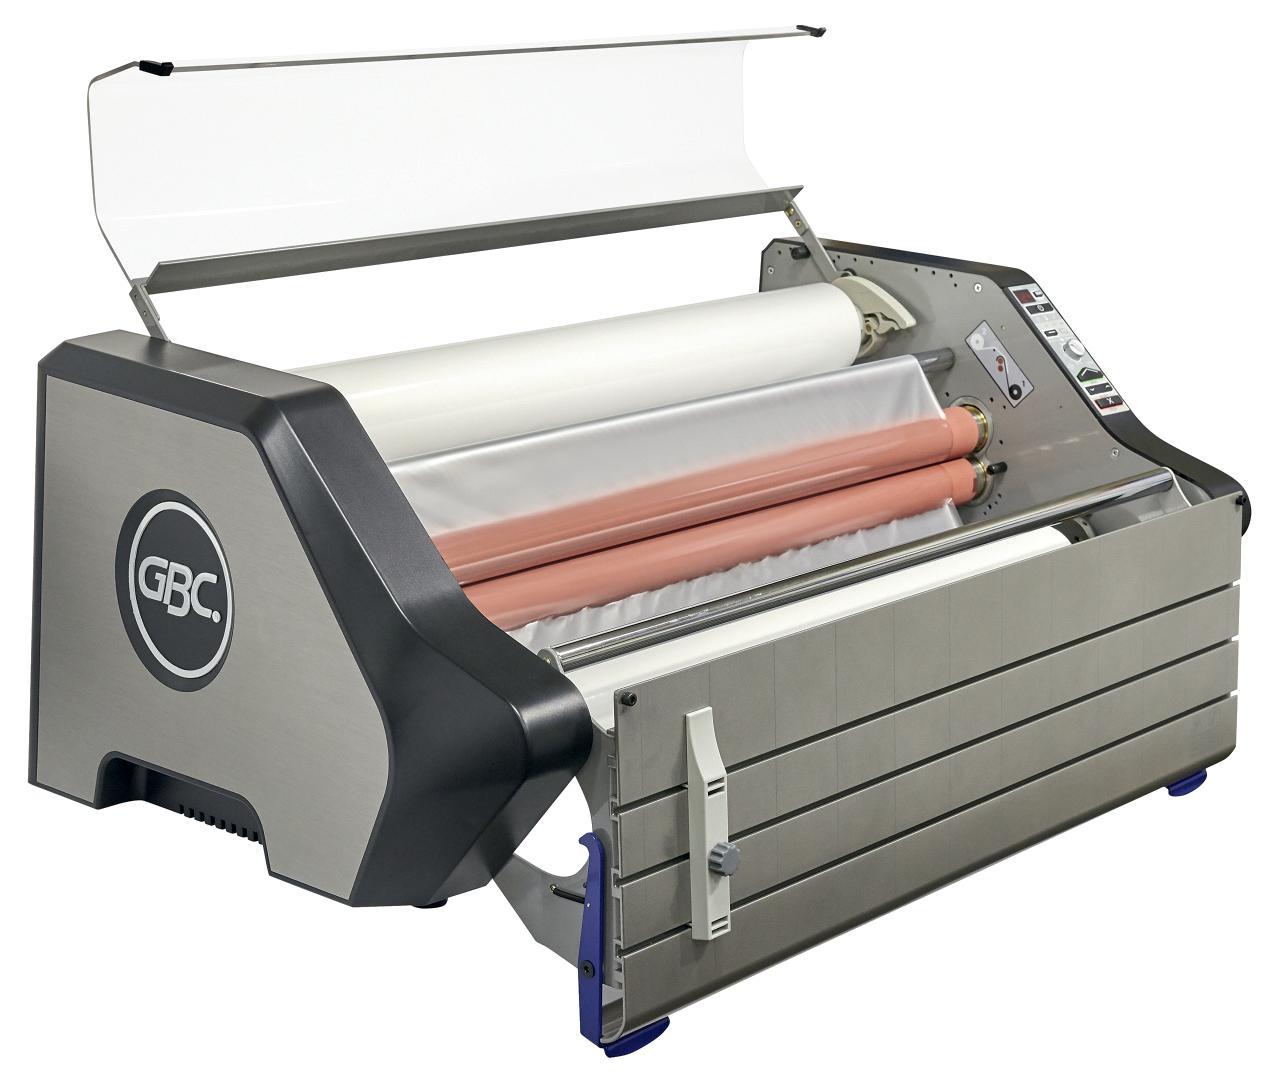 GBC Ultima 65 Roll Laminator